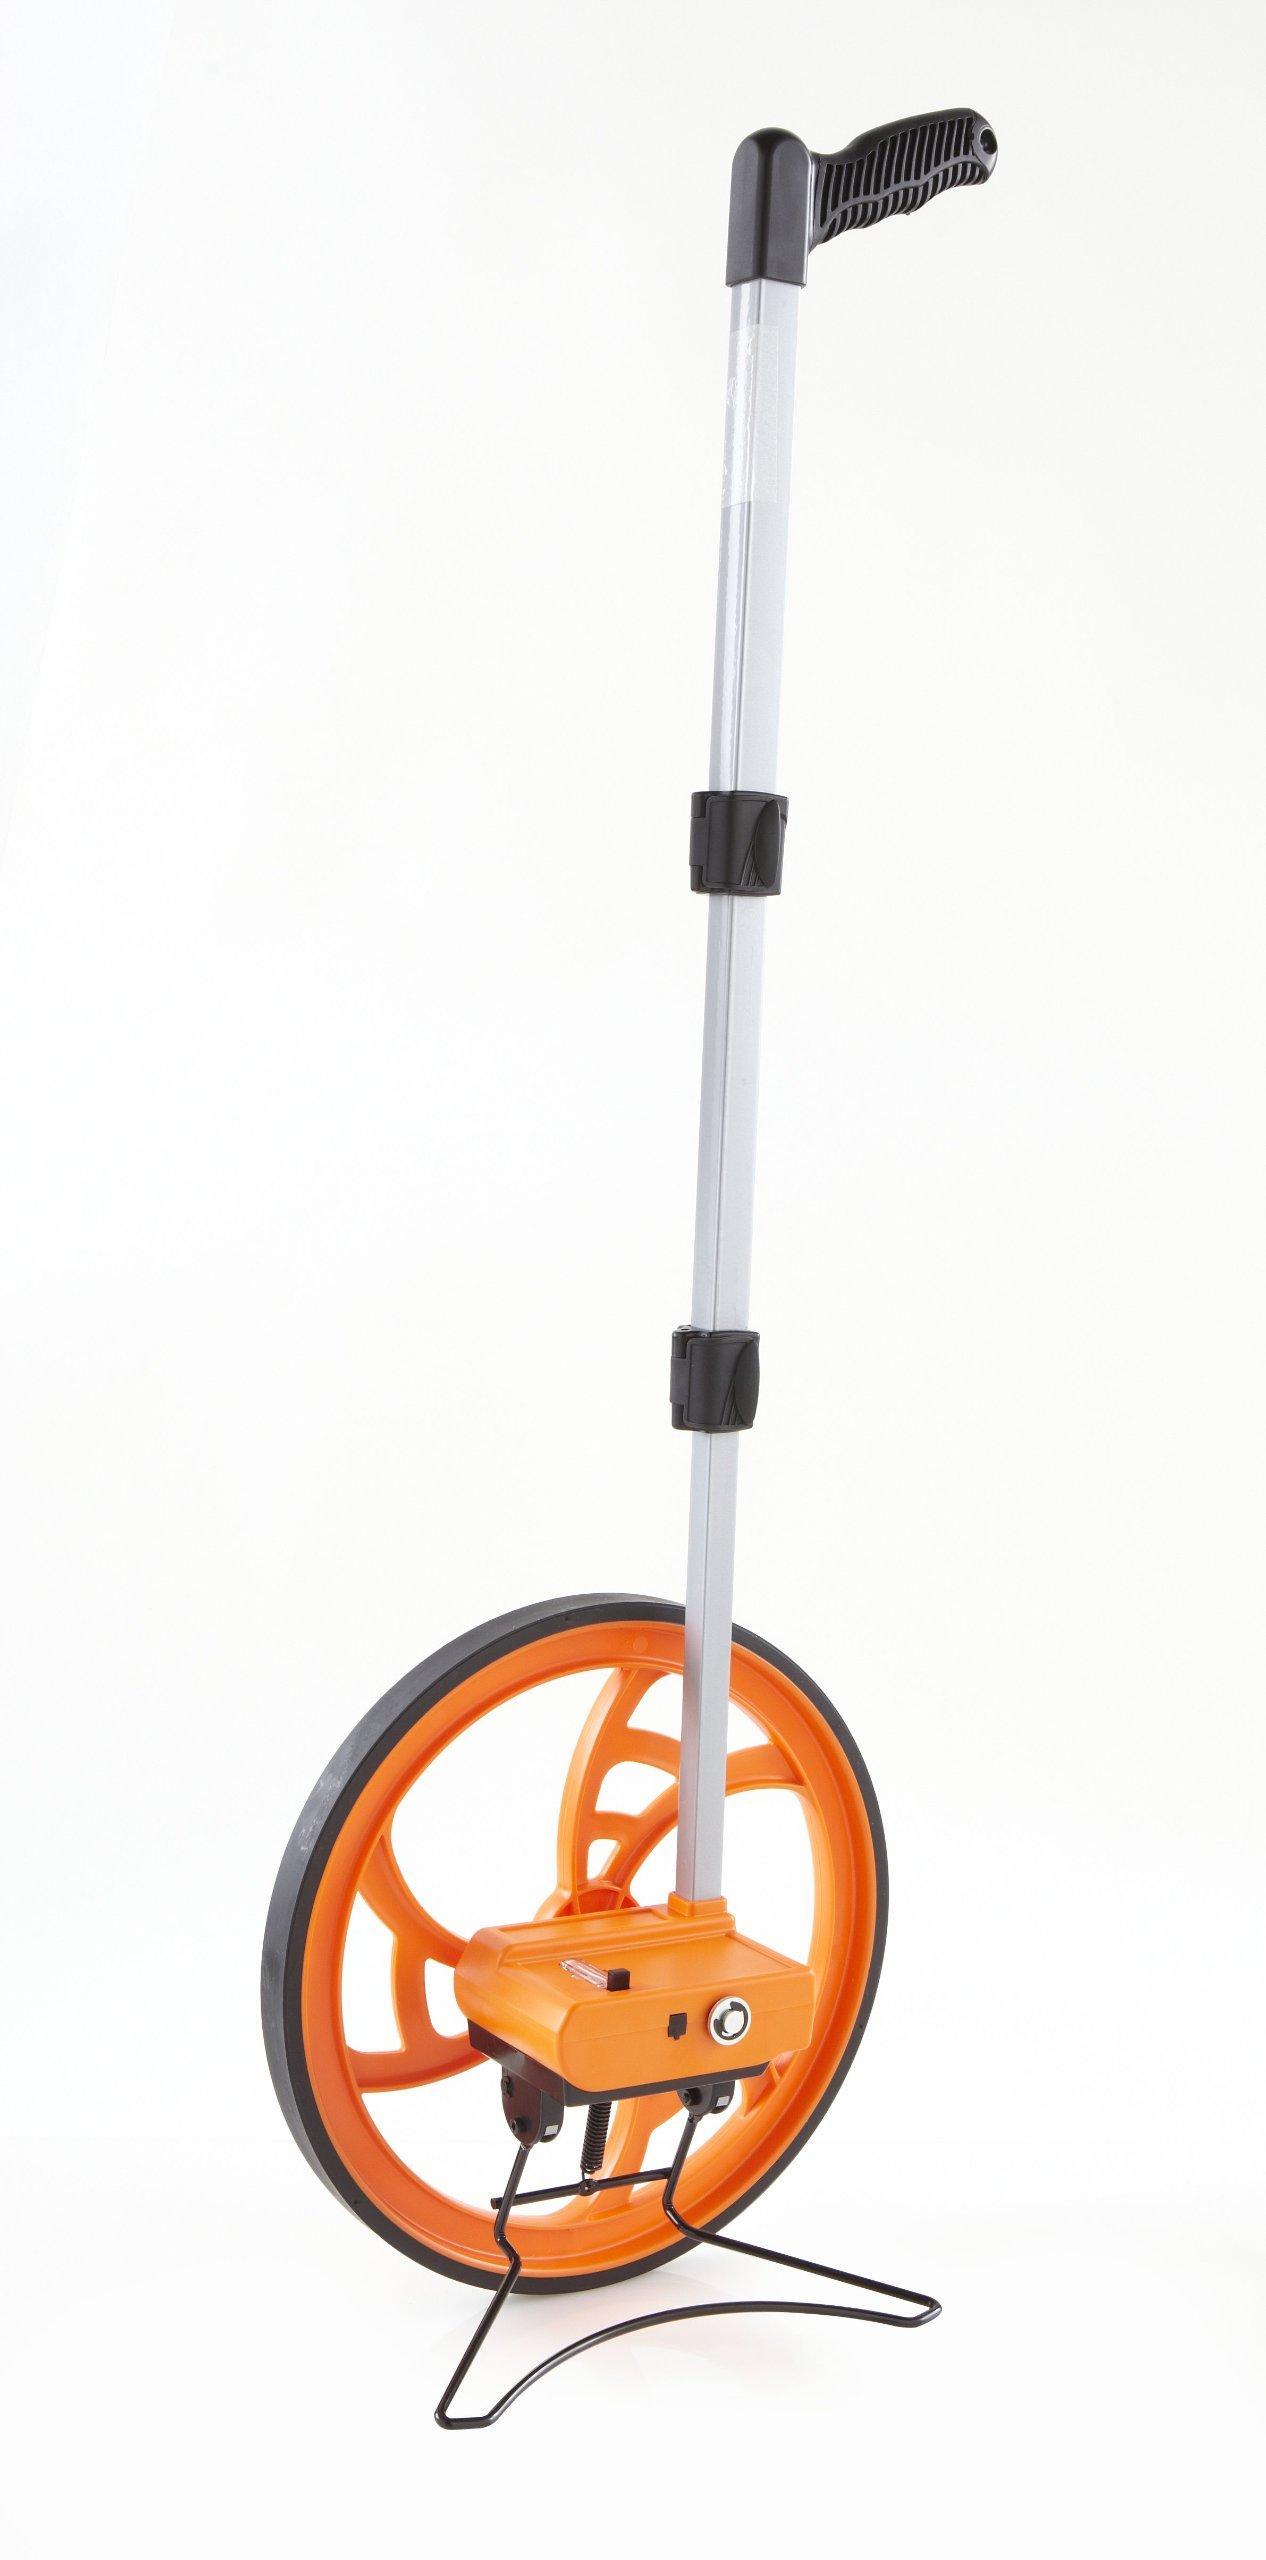 Keson RR318N Contractor Grade Measuring Wheel (Graduations: ft. & in.), 12-1/2-Inch Diameter